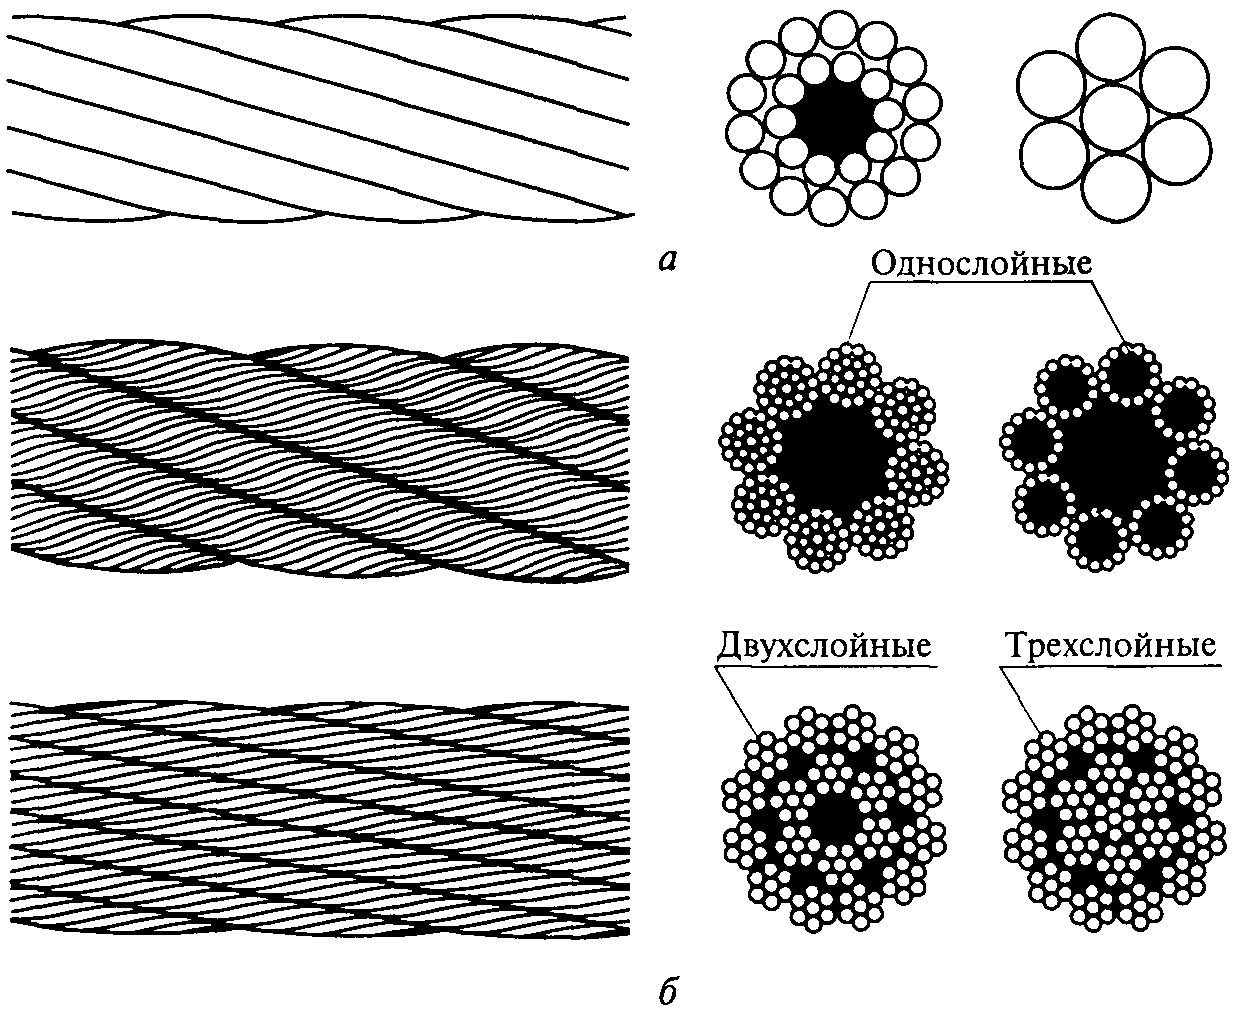 xarakteristiki-stalnyx-kanatov-kanat-dvojnoj-svivki-tipa-tk-lk-r